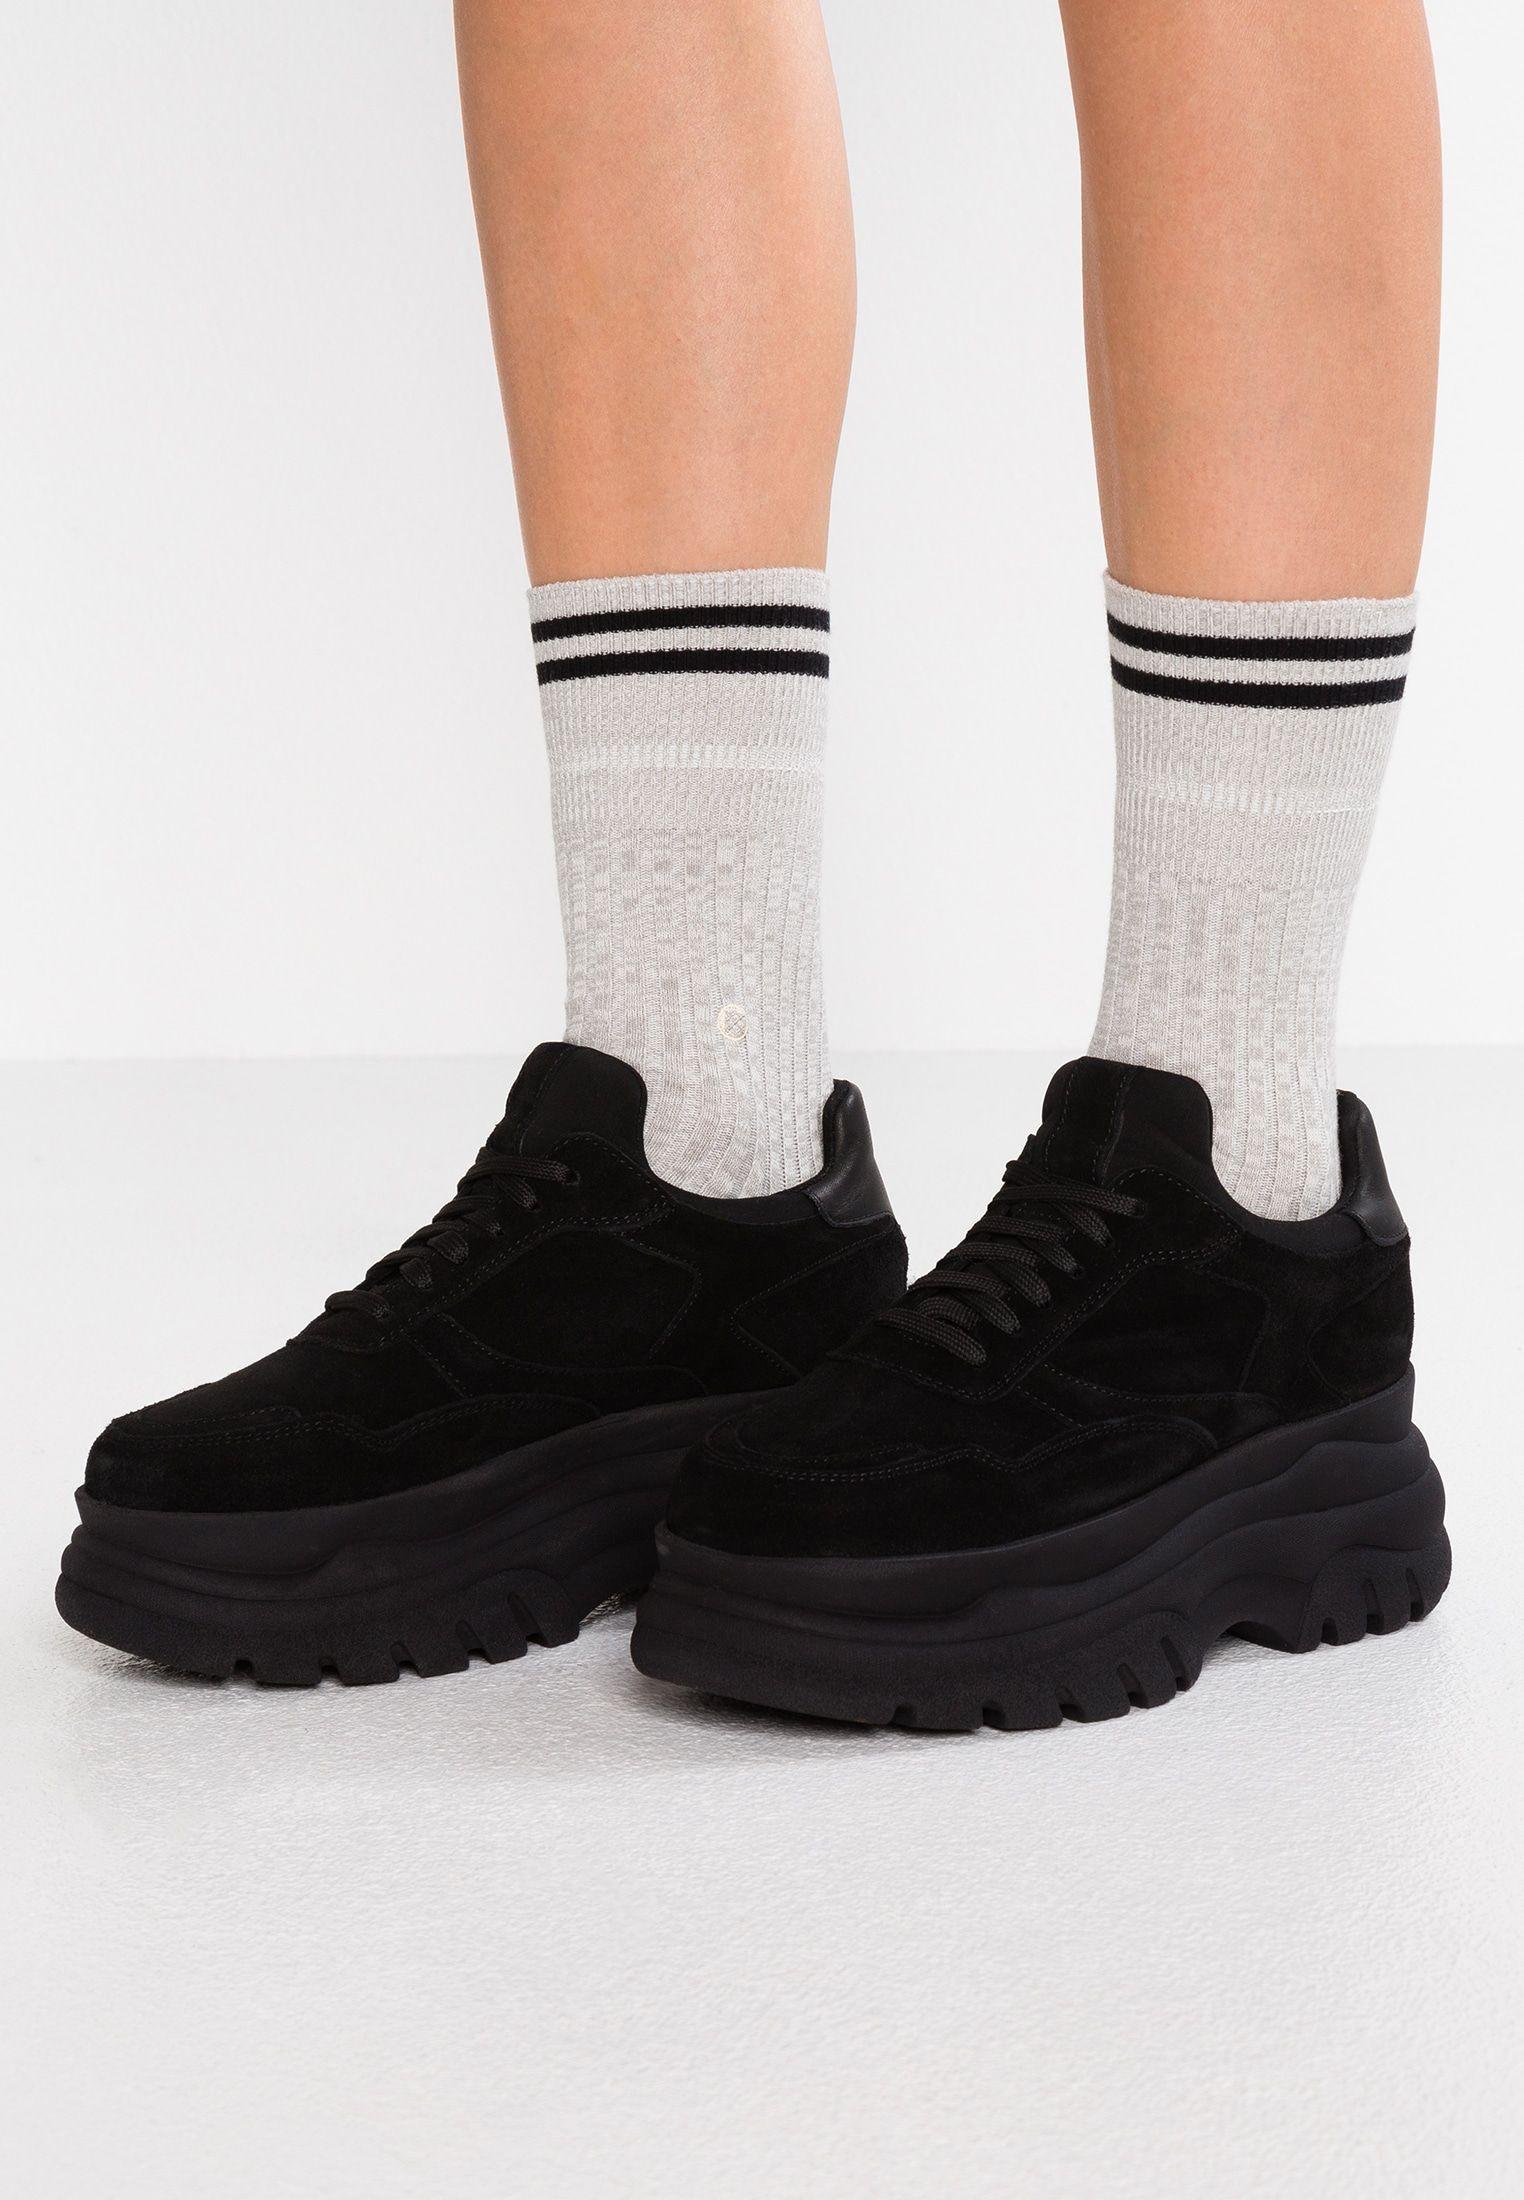 Low Low Low Black Sneaker Sneaker Black Sneaker Low Black Black Sneaker D9WEHe2IYb